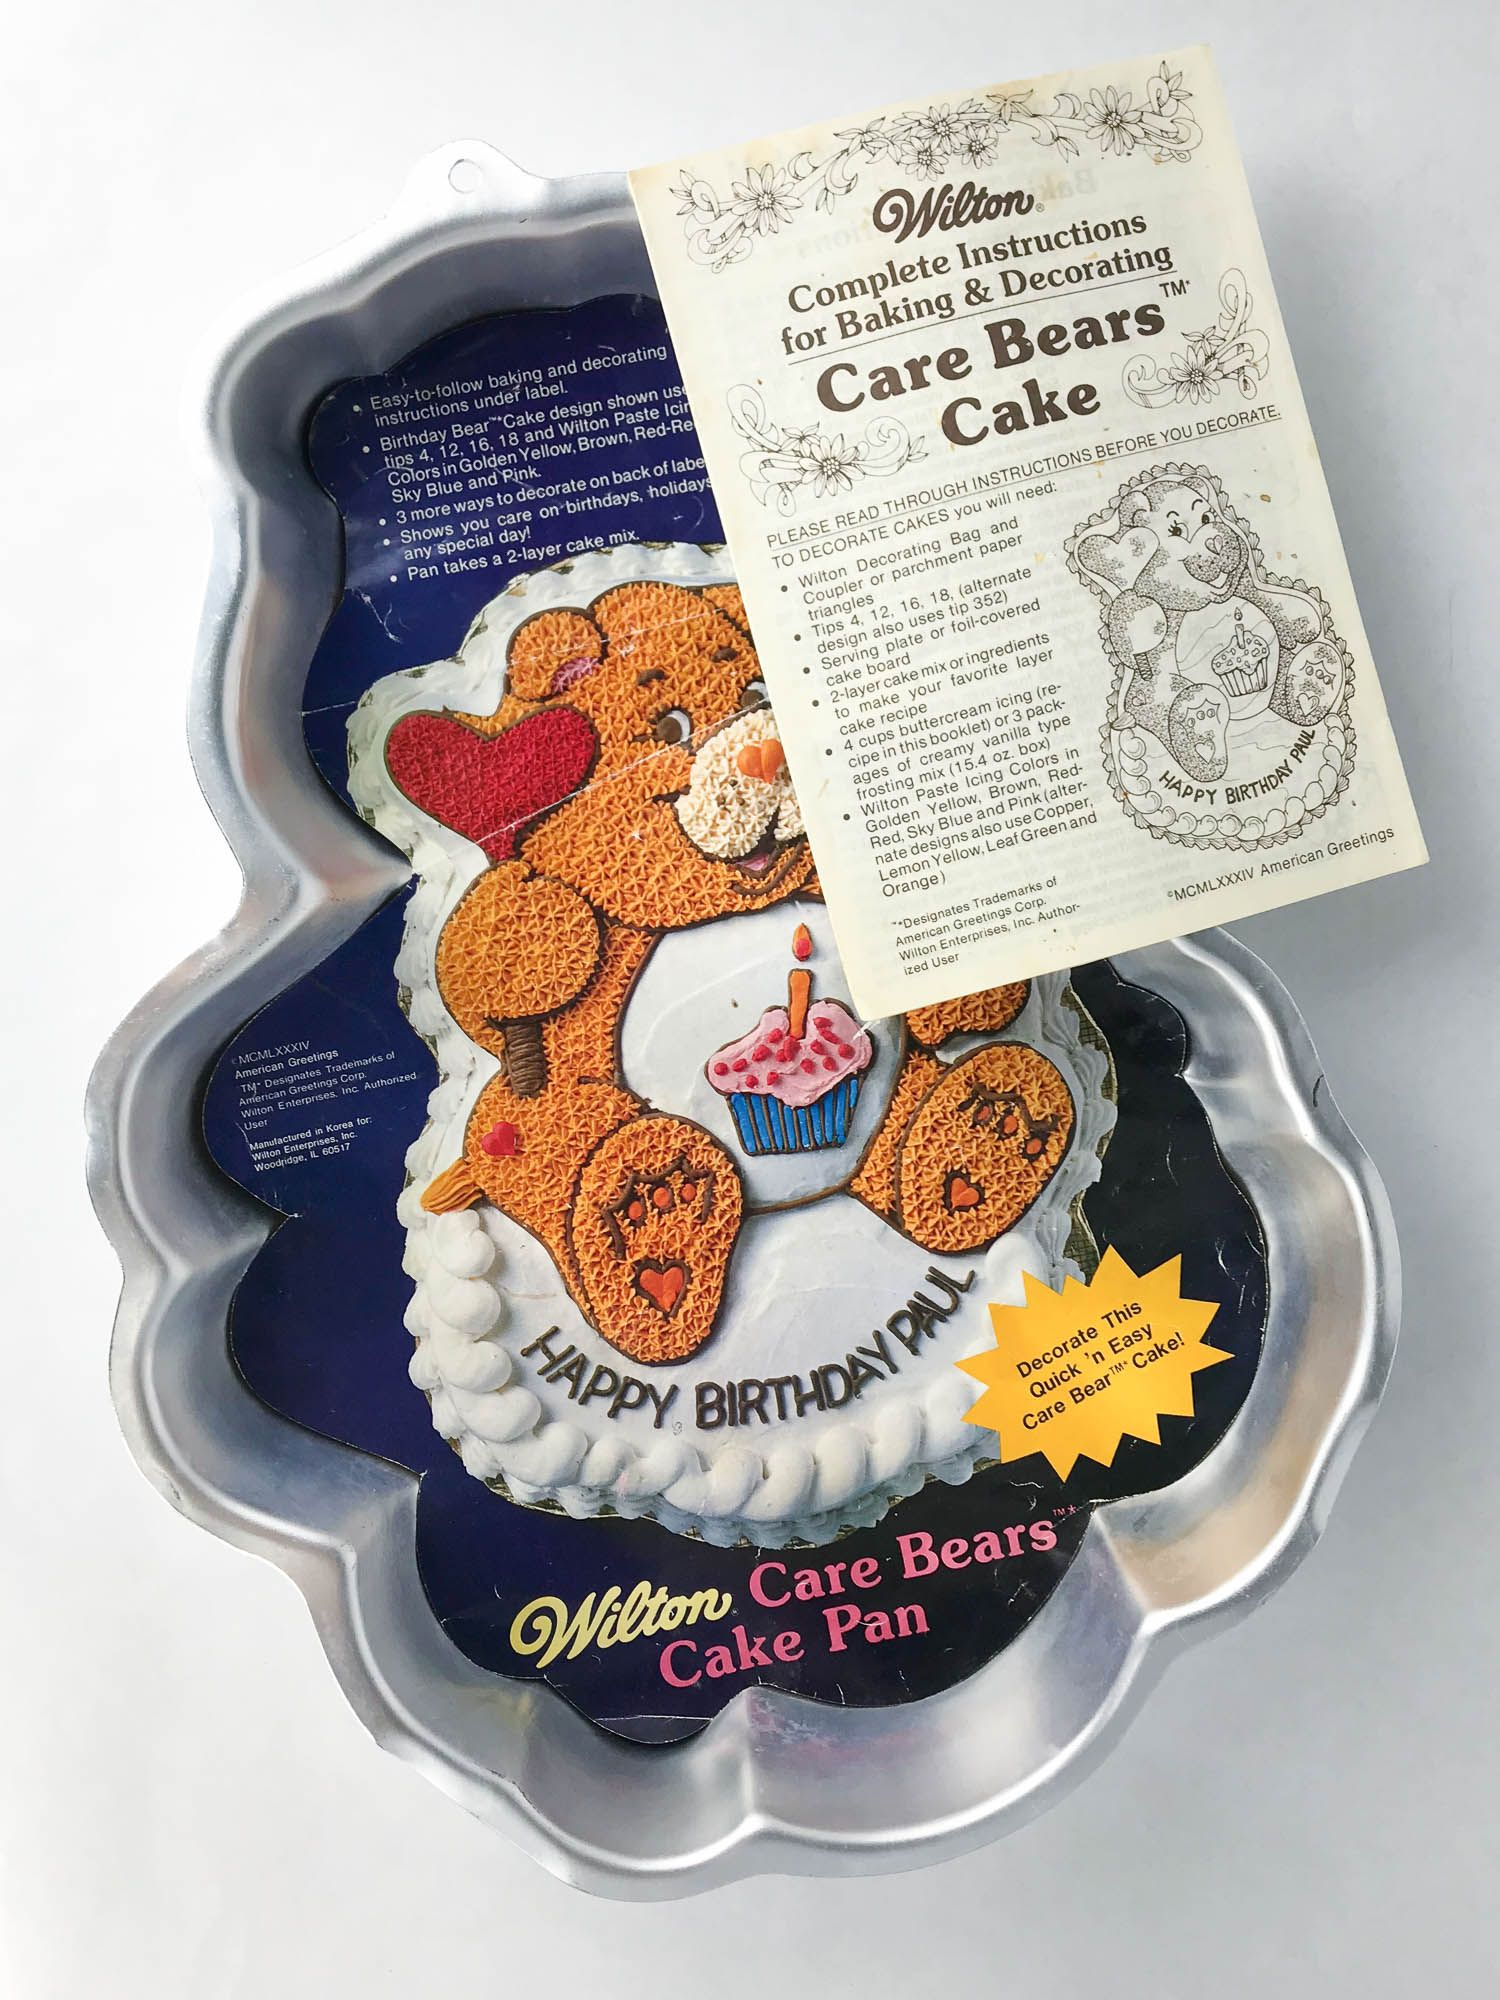 Fantastic Vintage Care Bears Birthday Bear 1983 Wilton Cake Pan With Funny Birthday Cards Online Barepcheapnameinfo